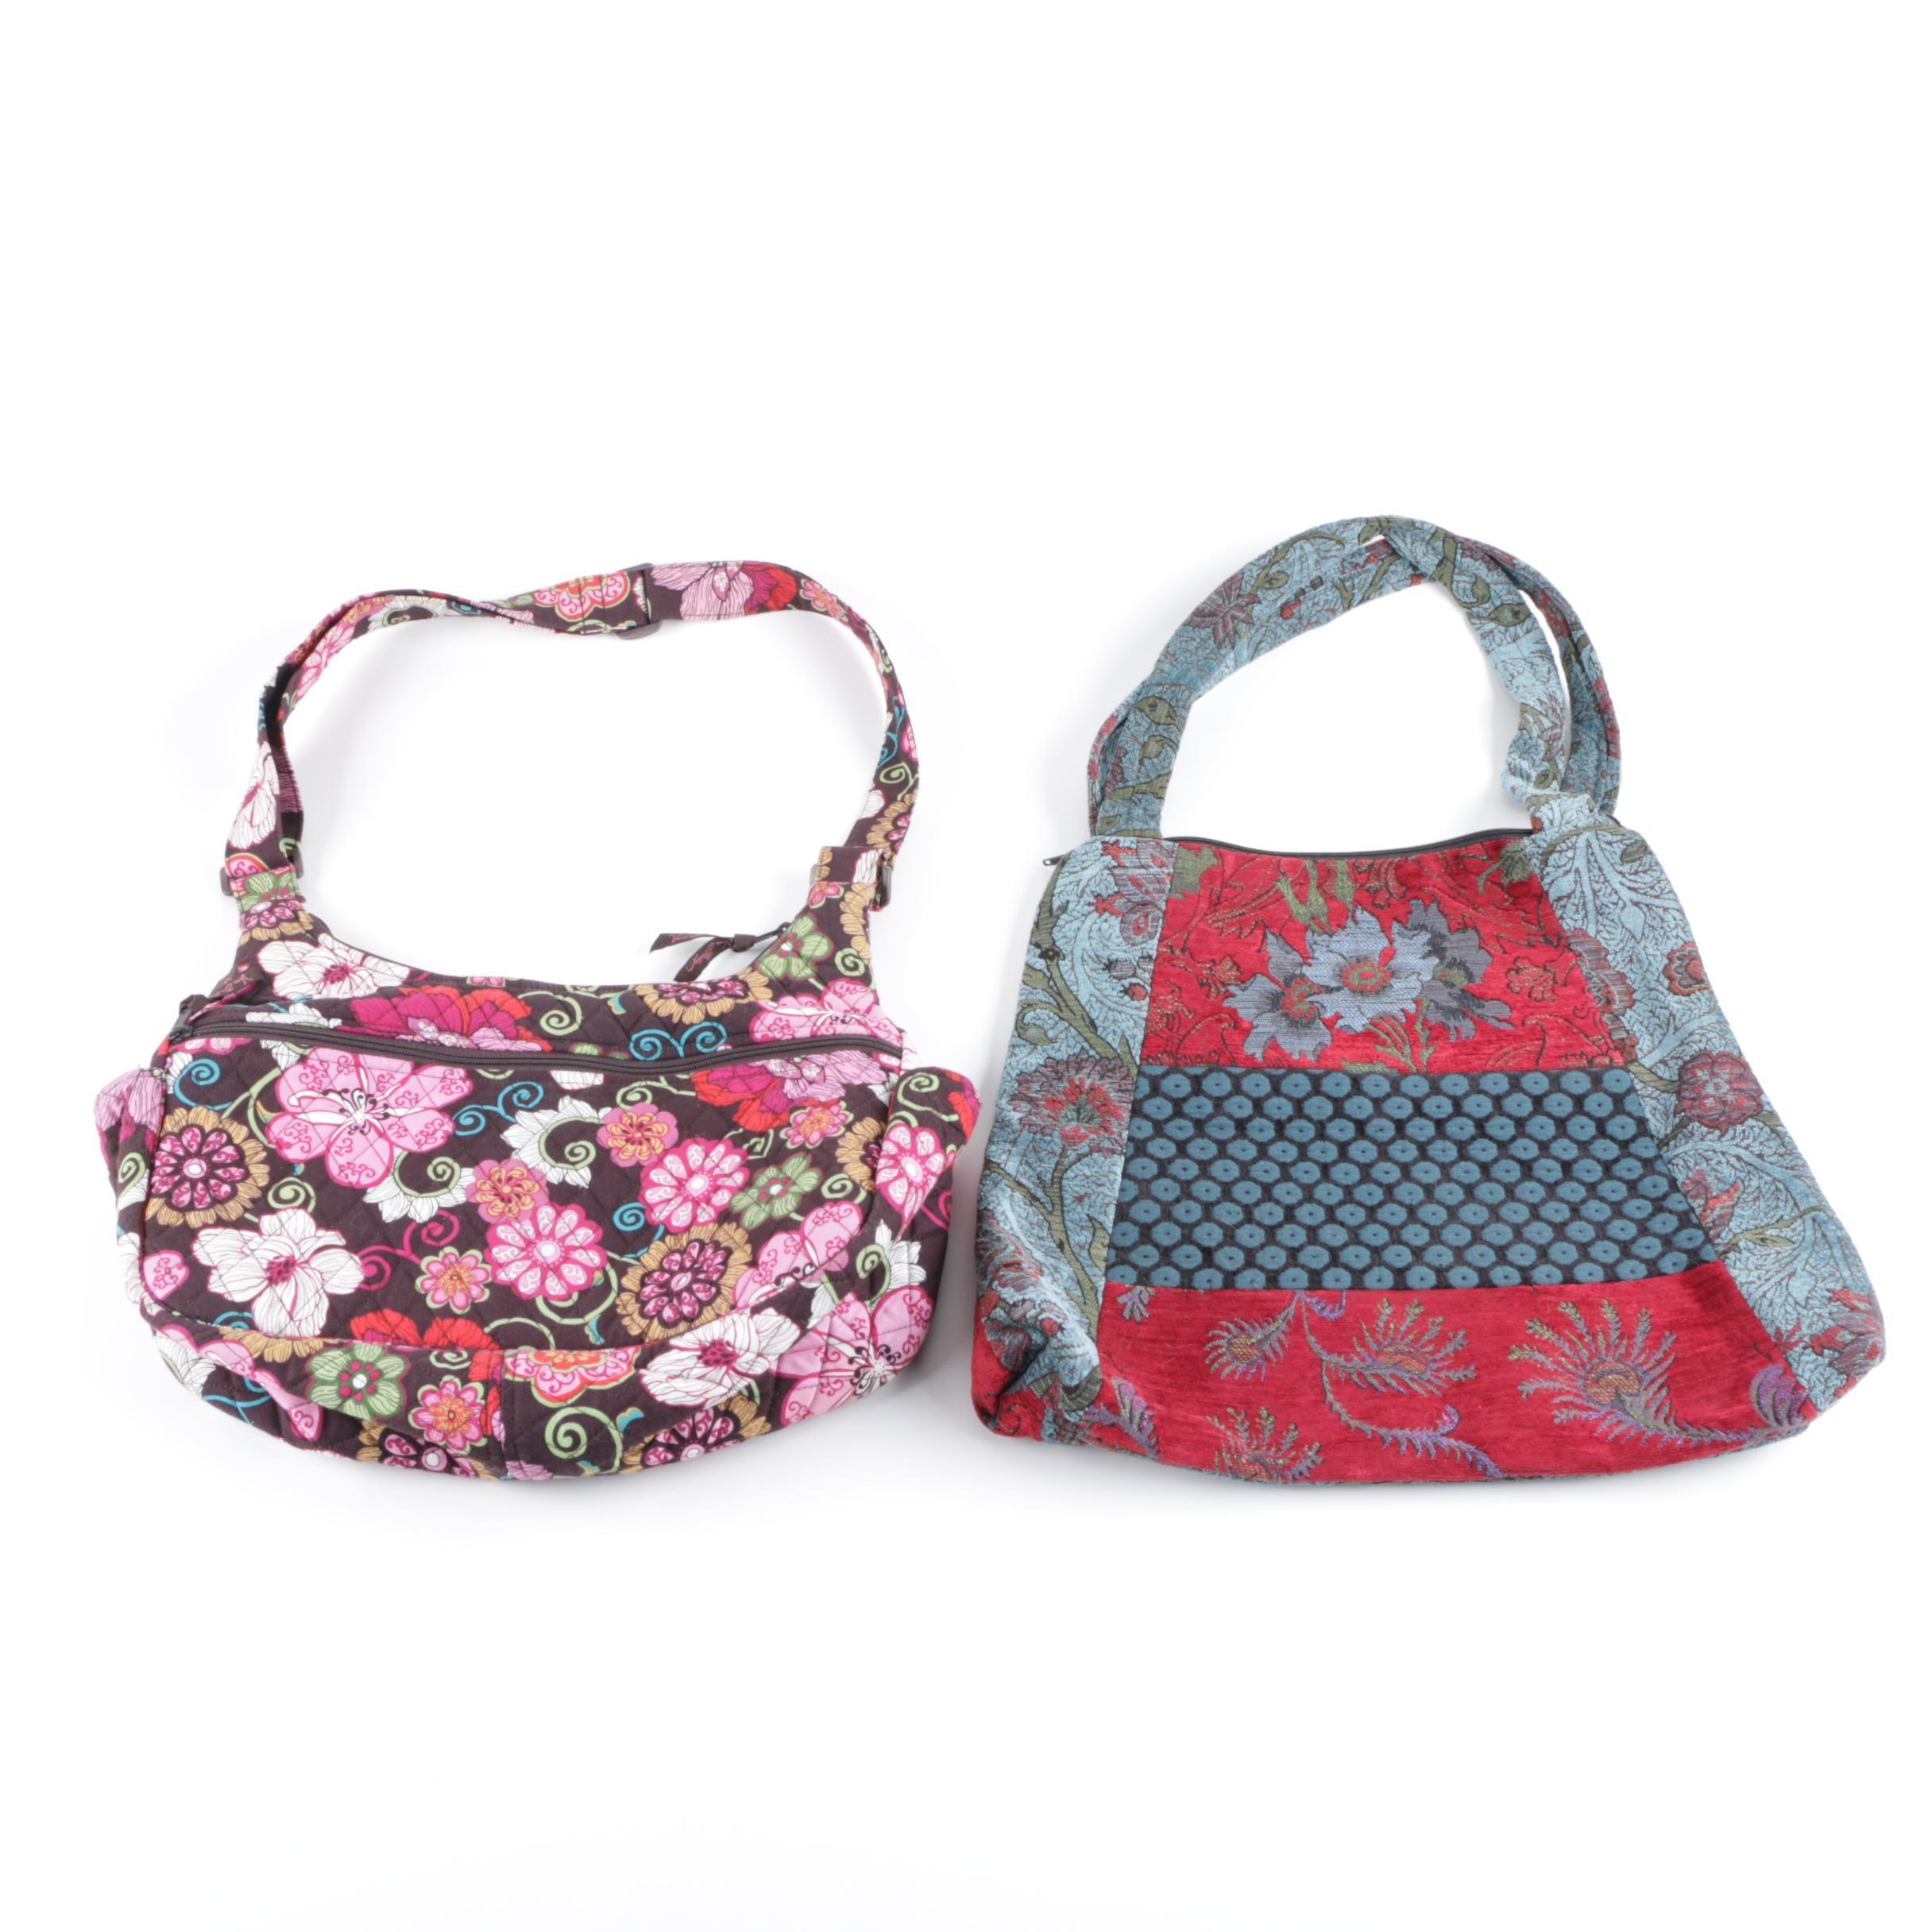 Vera Bradley and Mary Lynn O'Shea Fabric Shoulder Bags